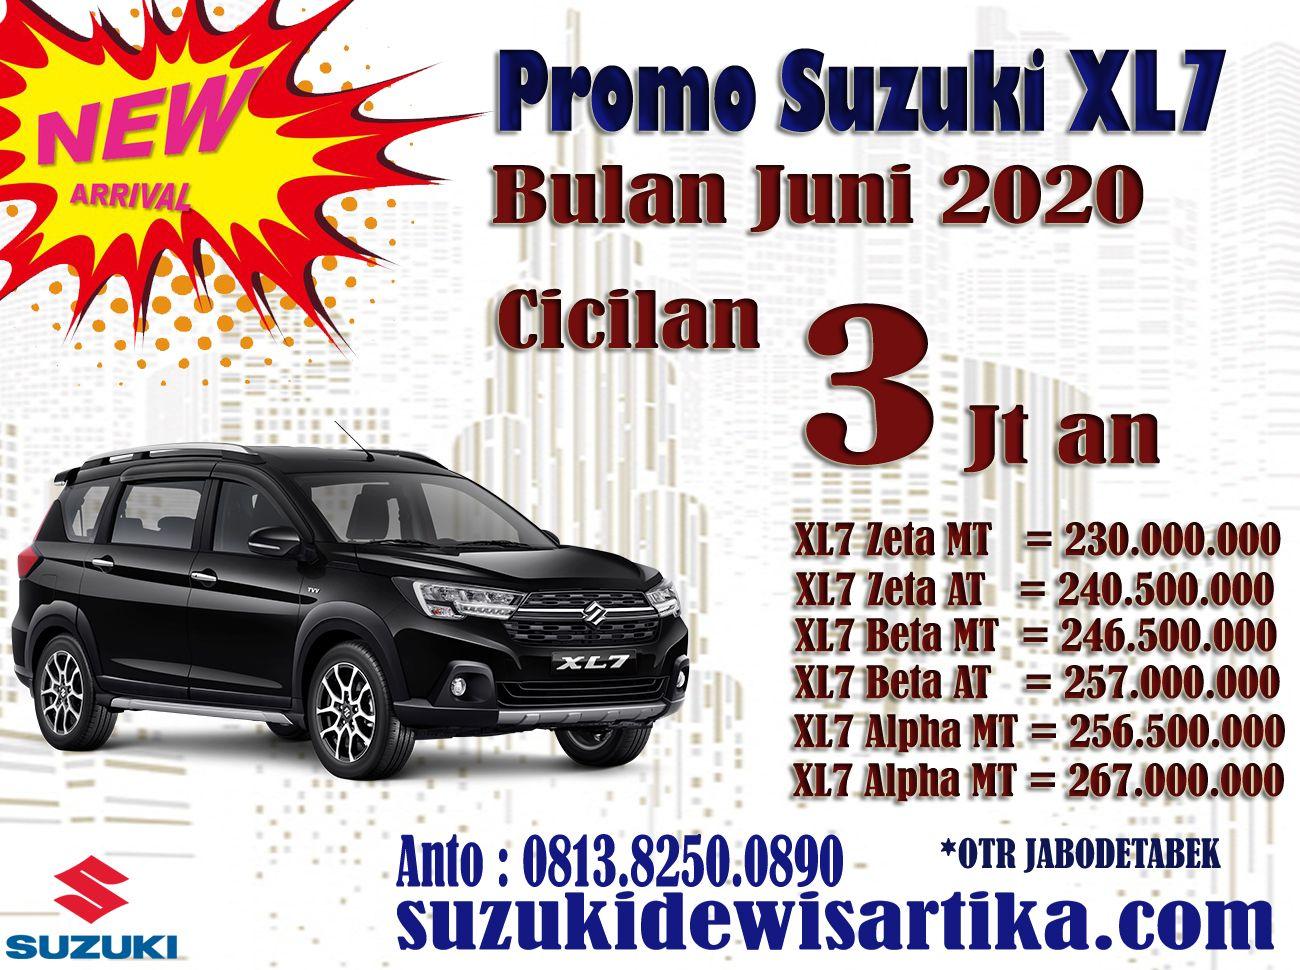 Promo Suzuki Xl7 Bulan Juni 2020